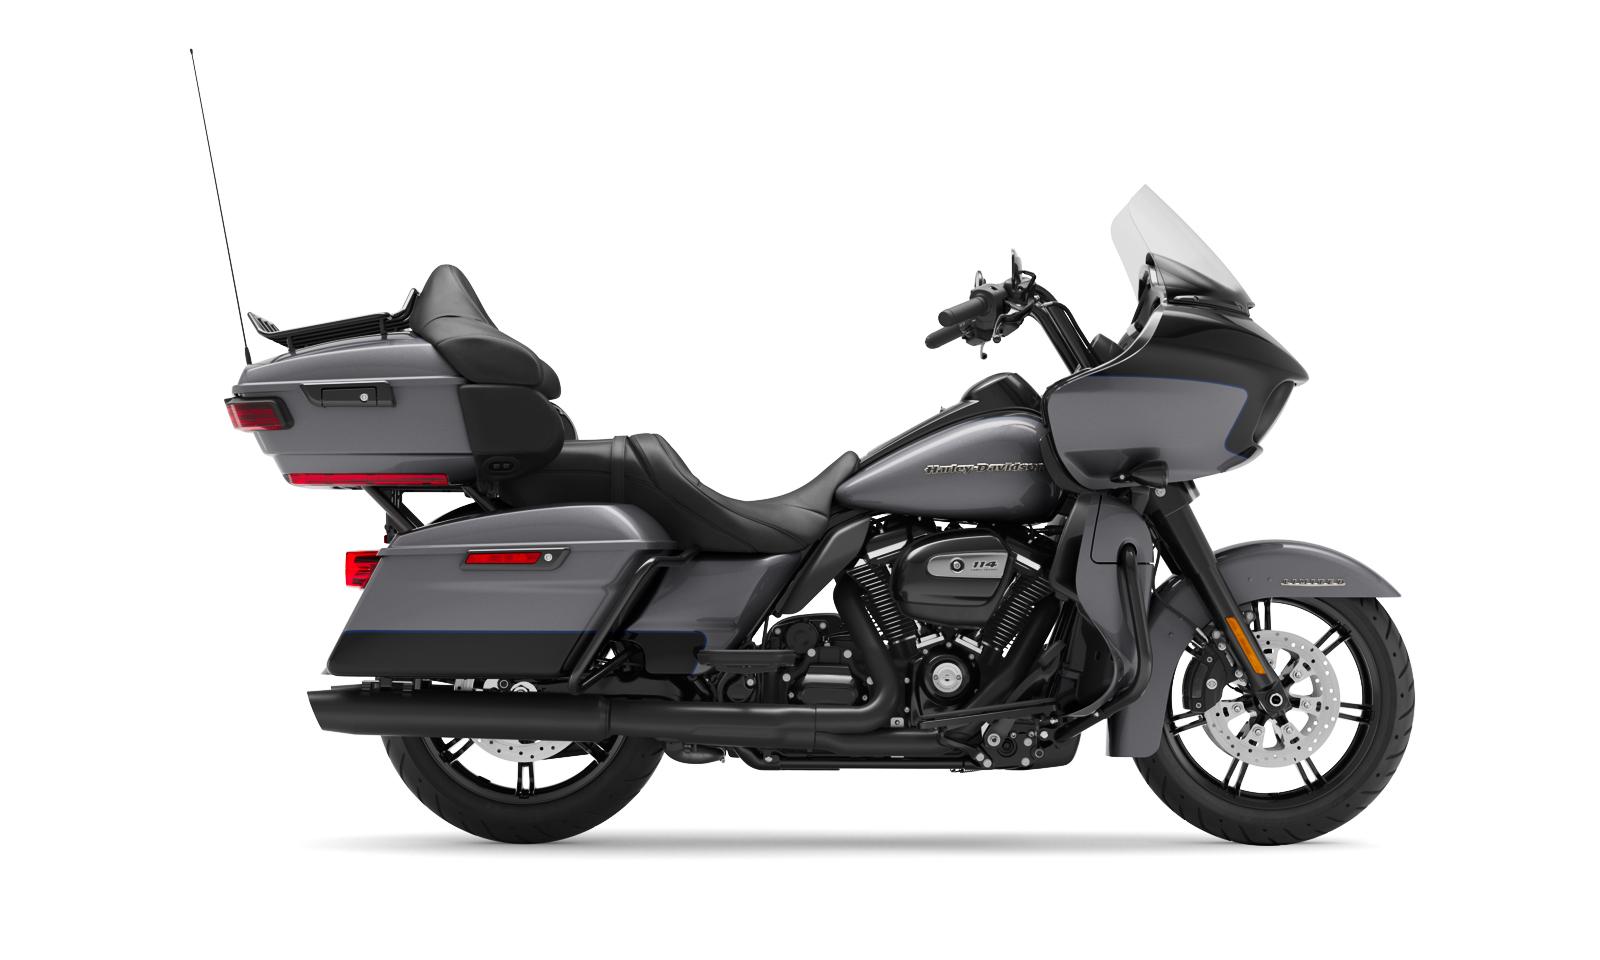 Motocicleta Road Glide Limited 2021 Harley Davidson Brasil